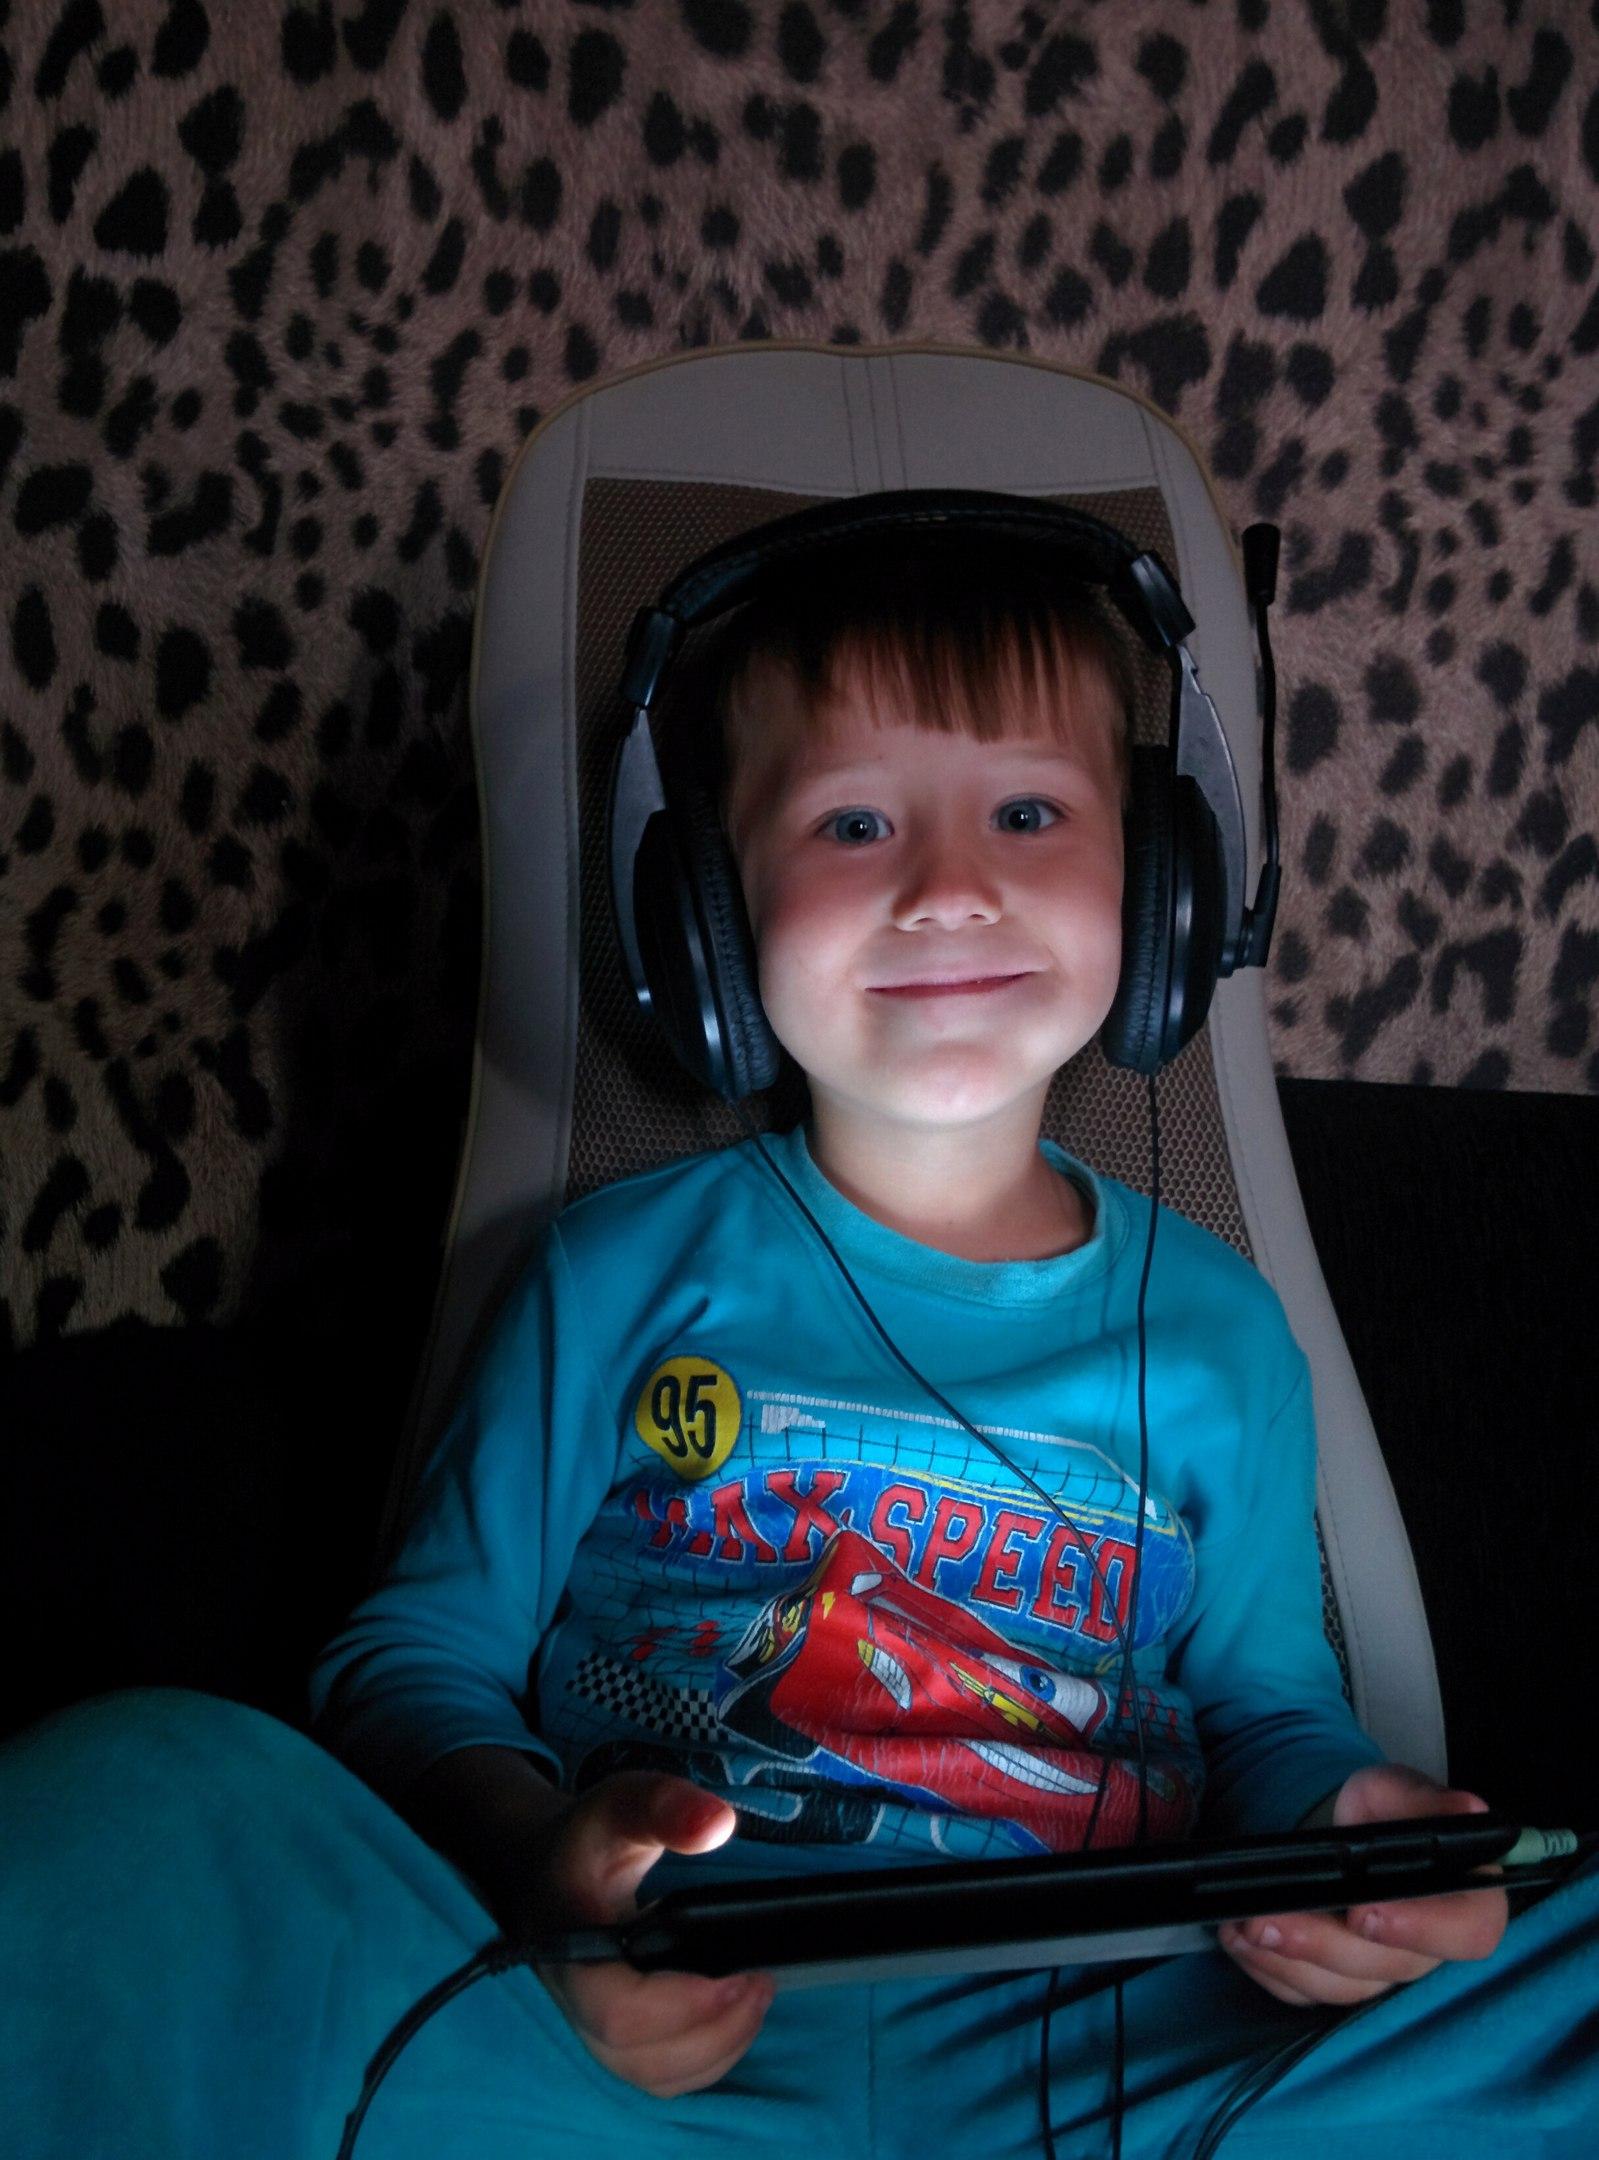 Тишина и спокойствие XD. Дети в интернете